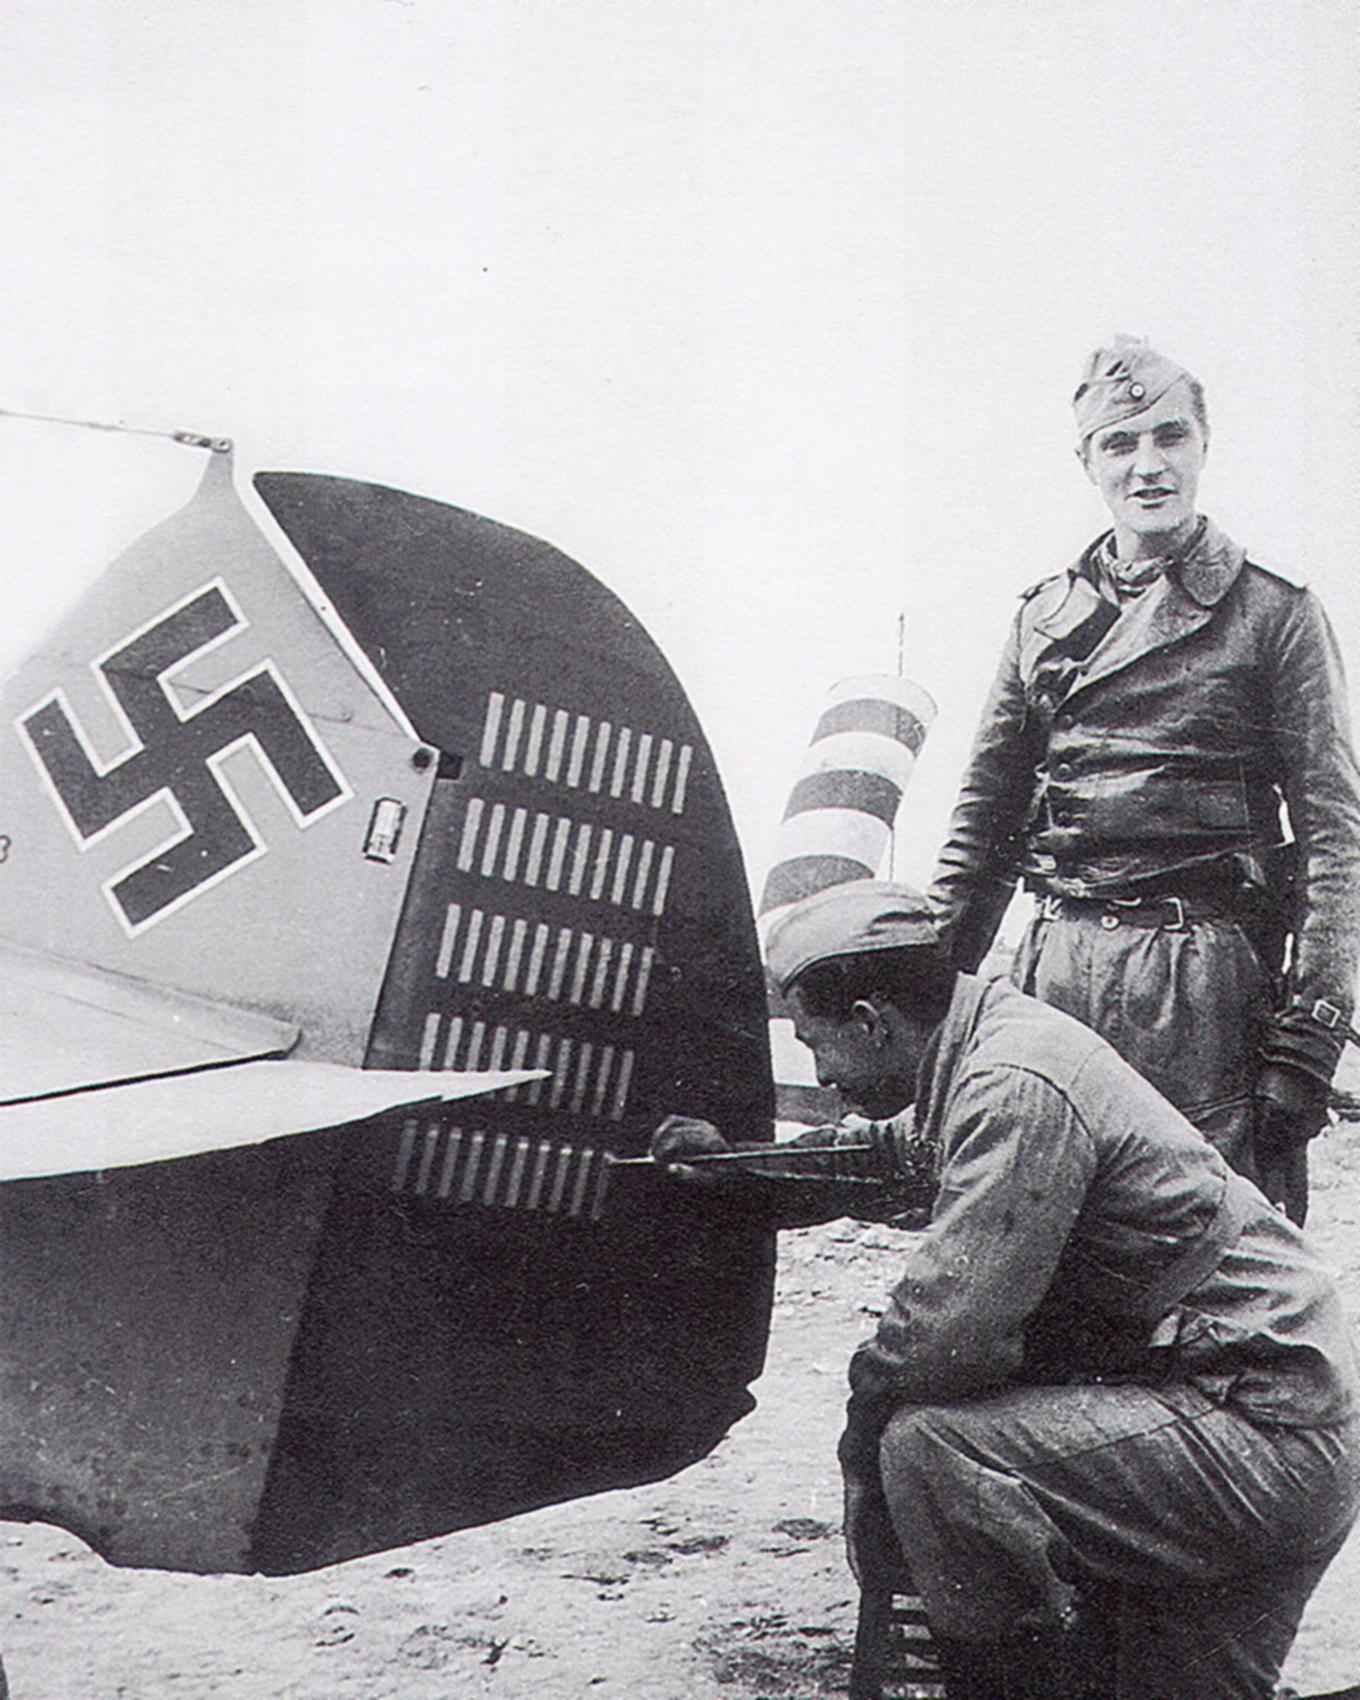 Messerschmitt Bf 109F4Trop 3.JG27 Yellow 14 Hans Joachim Marseille WNr 8693 Martuba Feb 1942 07